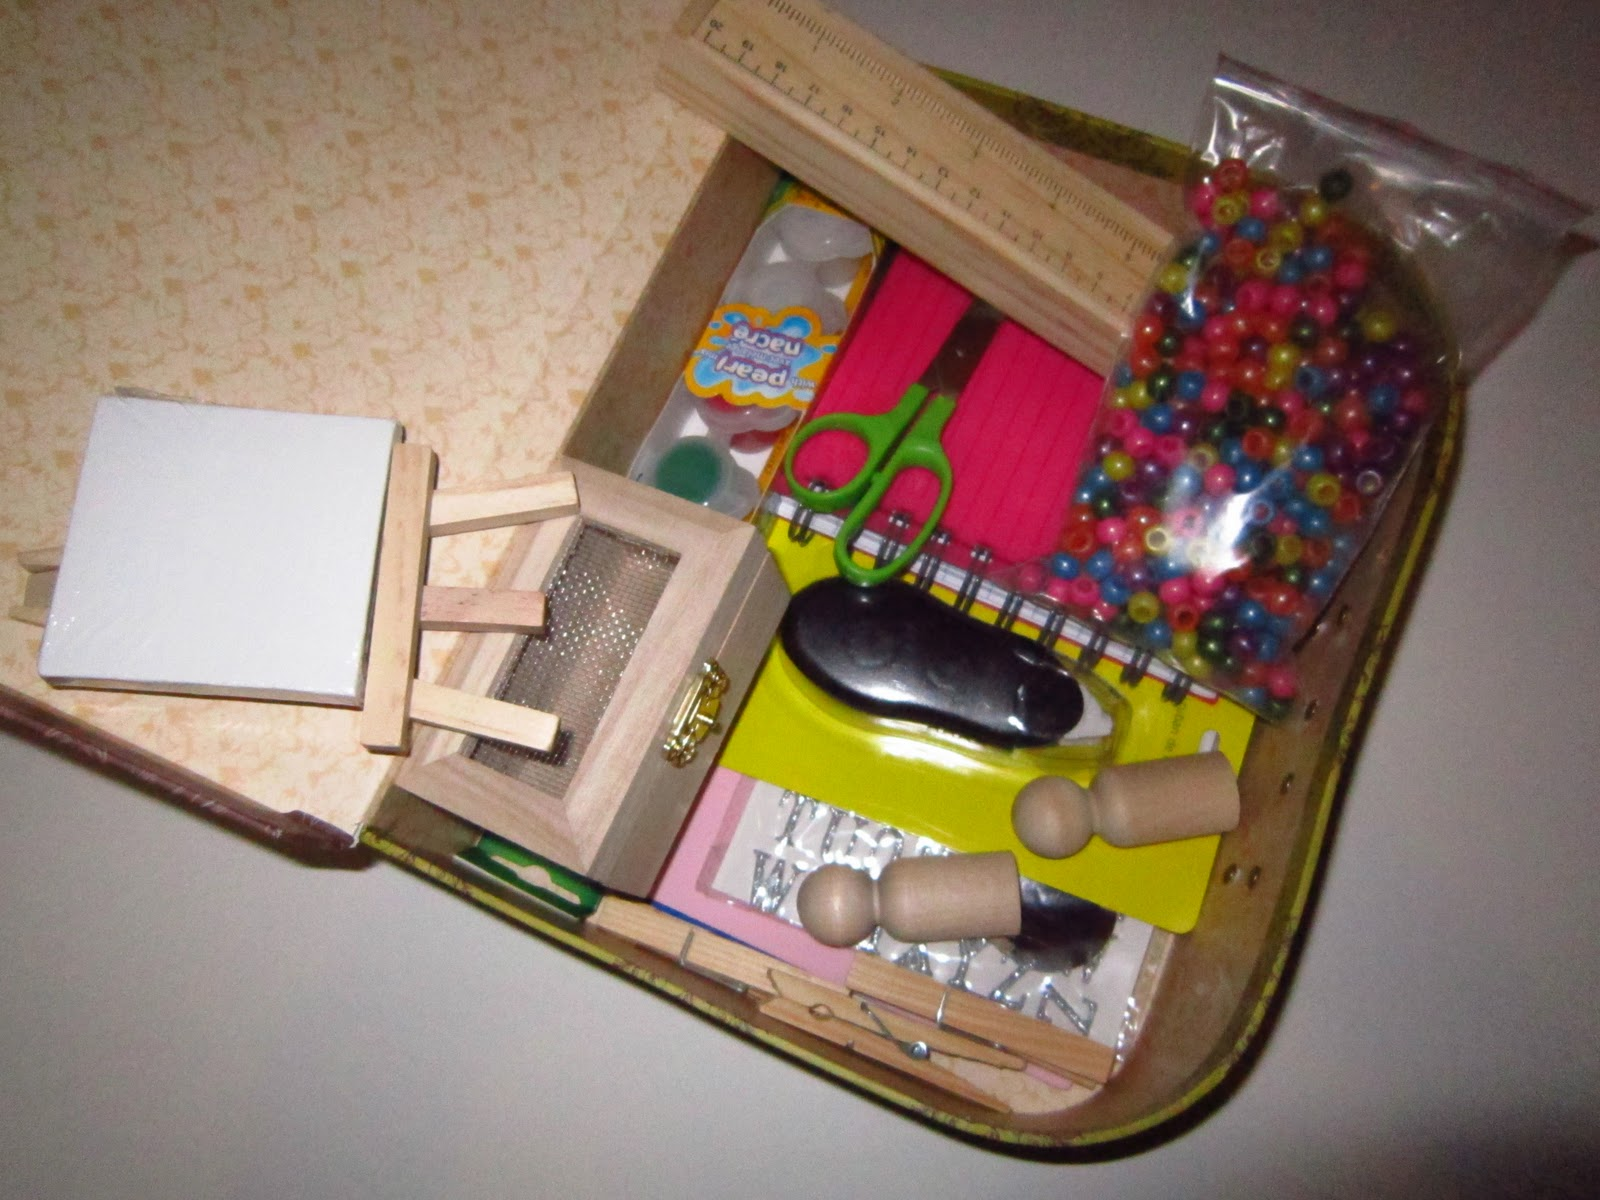 Cardboard Easel Personalized